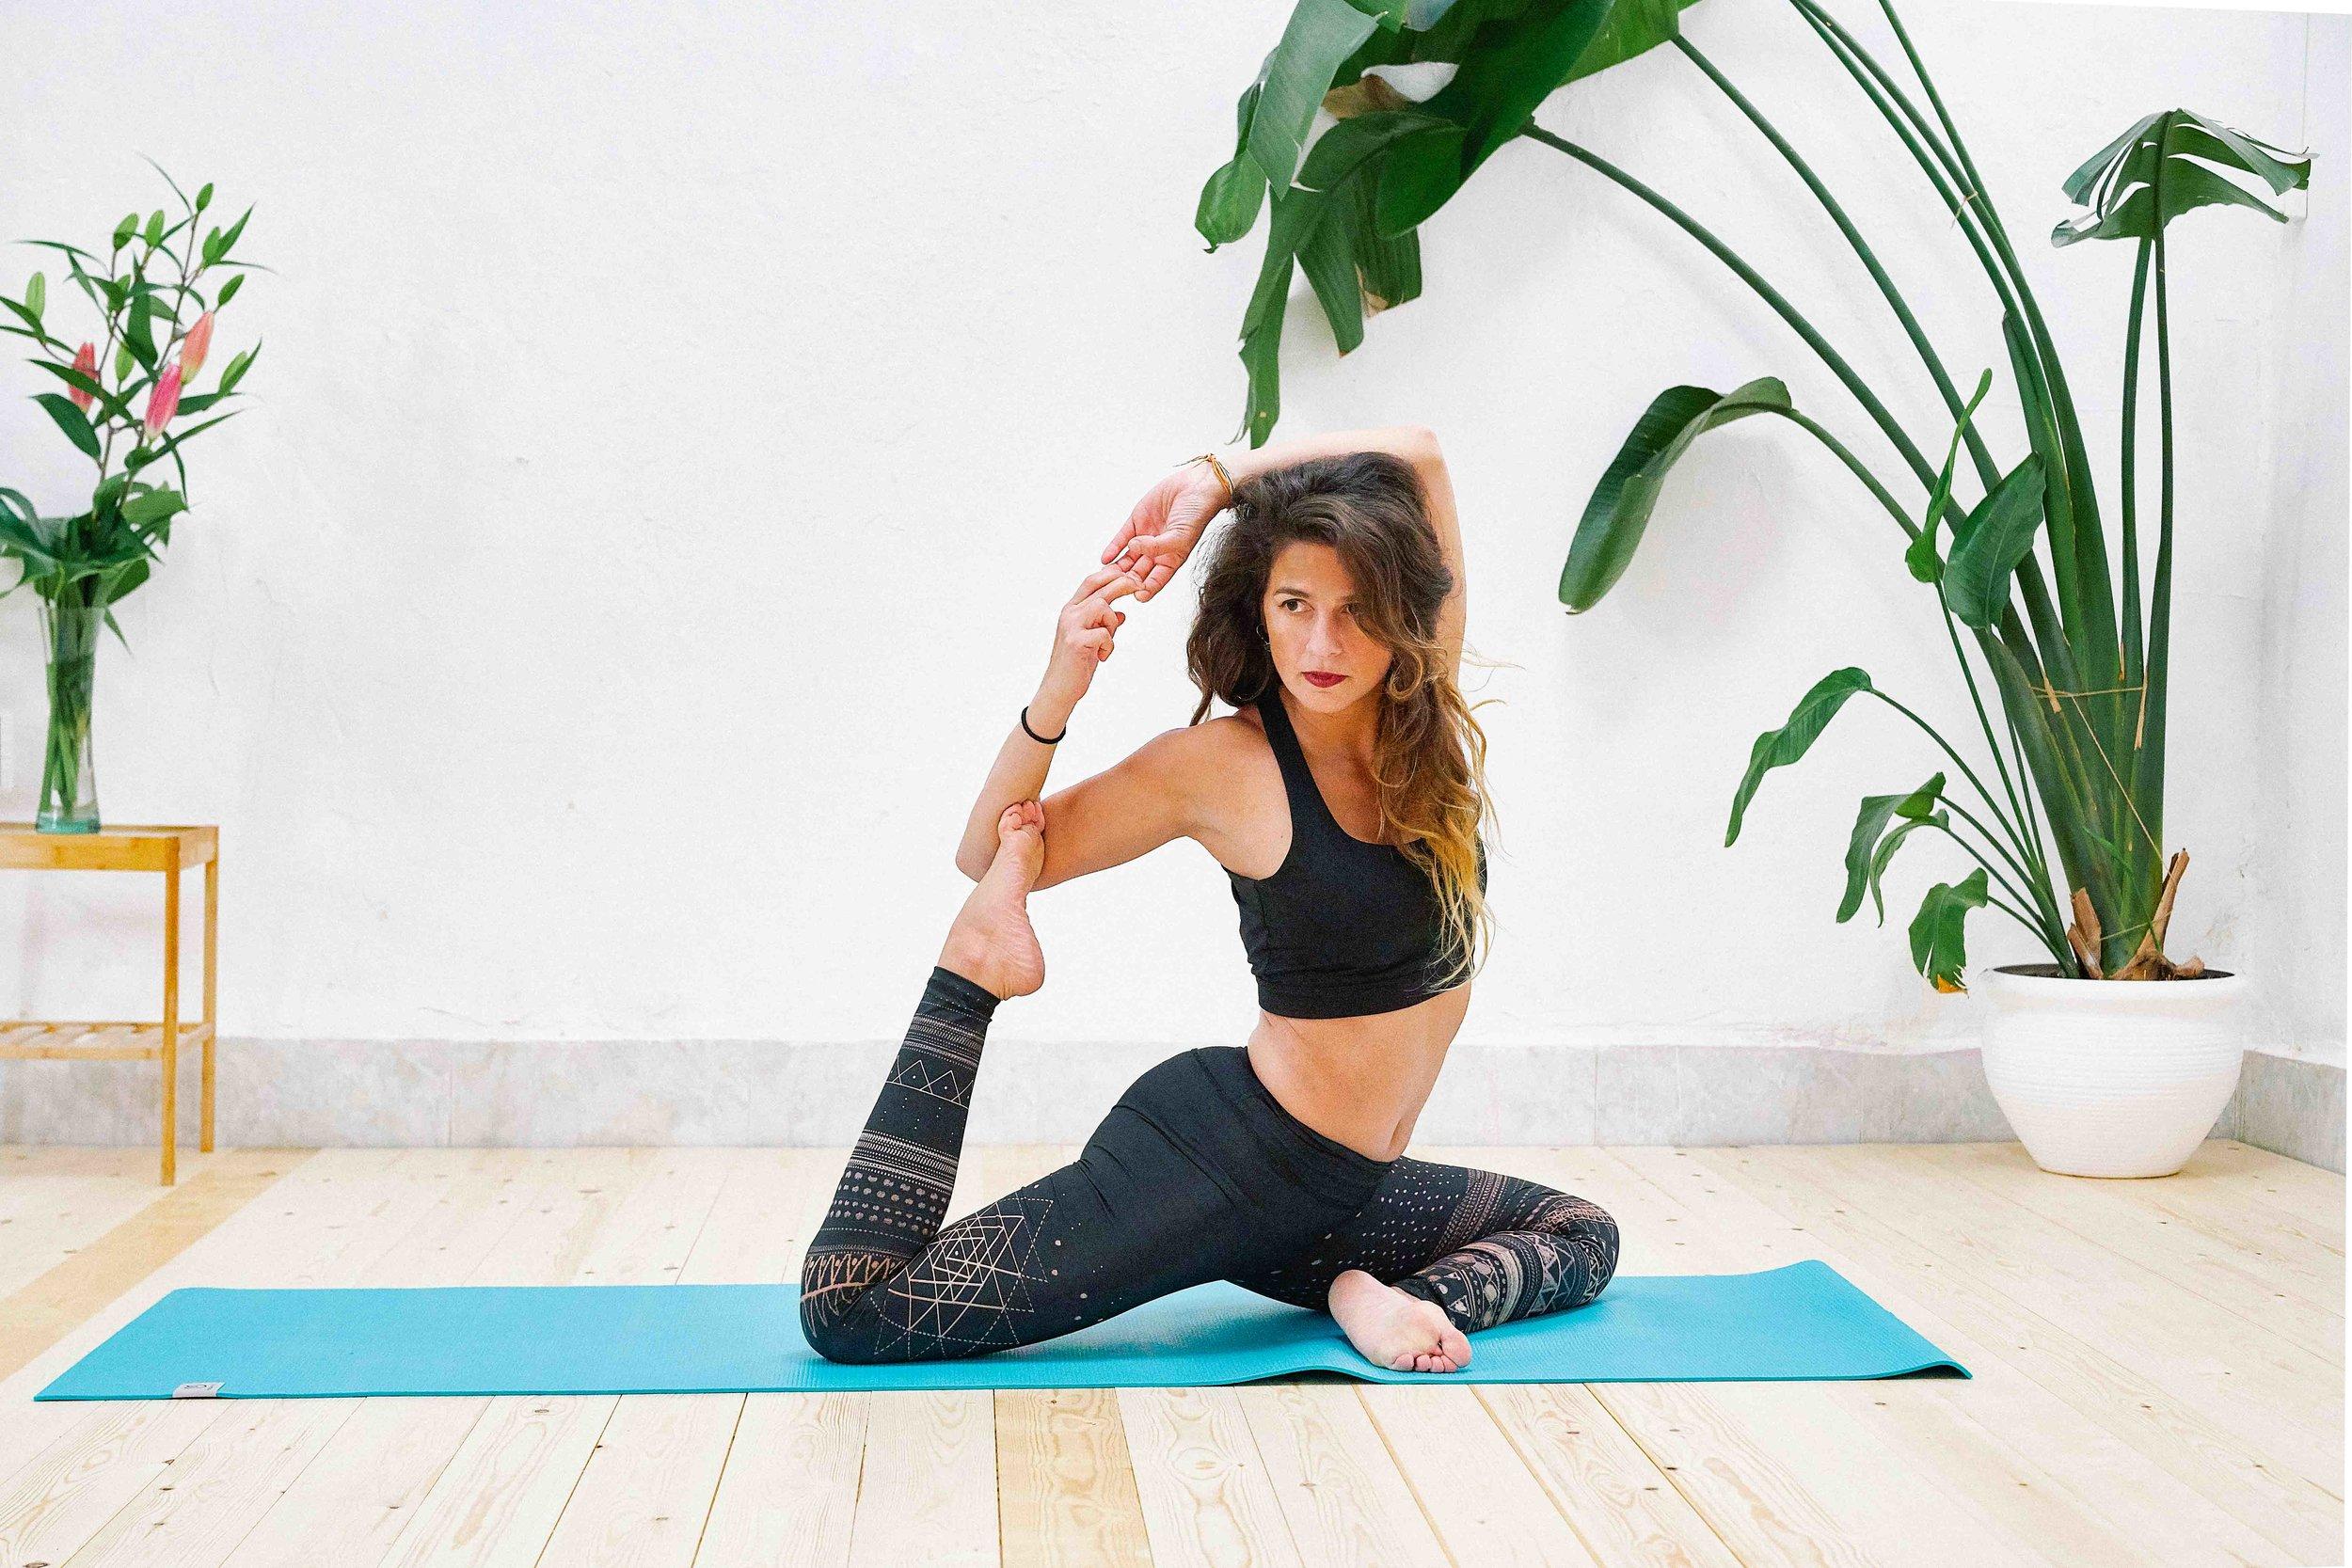 Yoga studio barcelona small (3 of 5).jpg